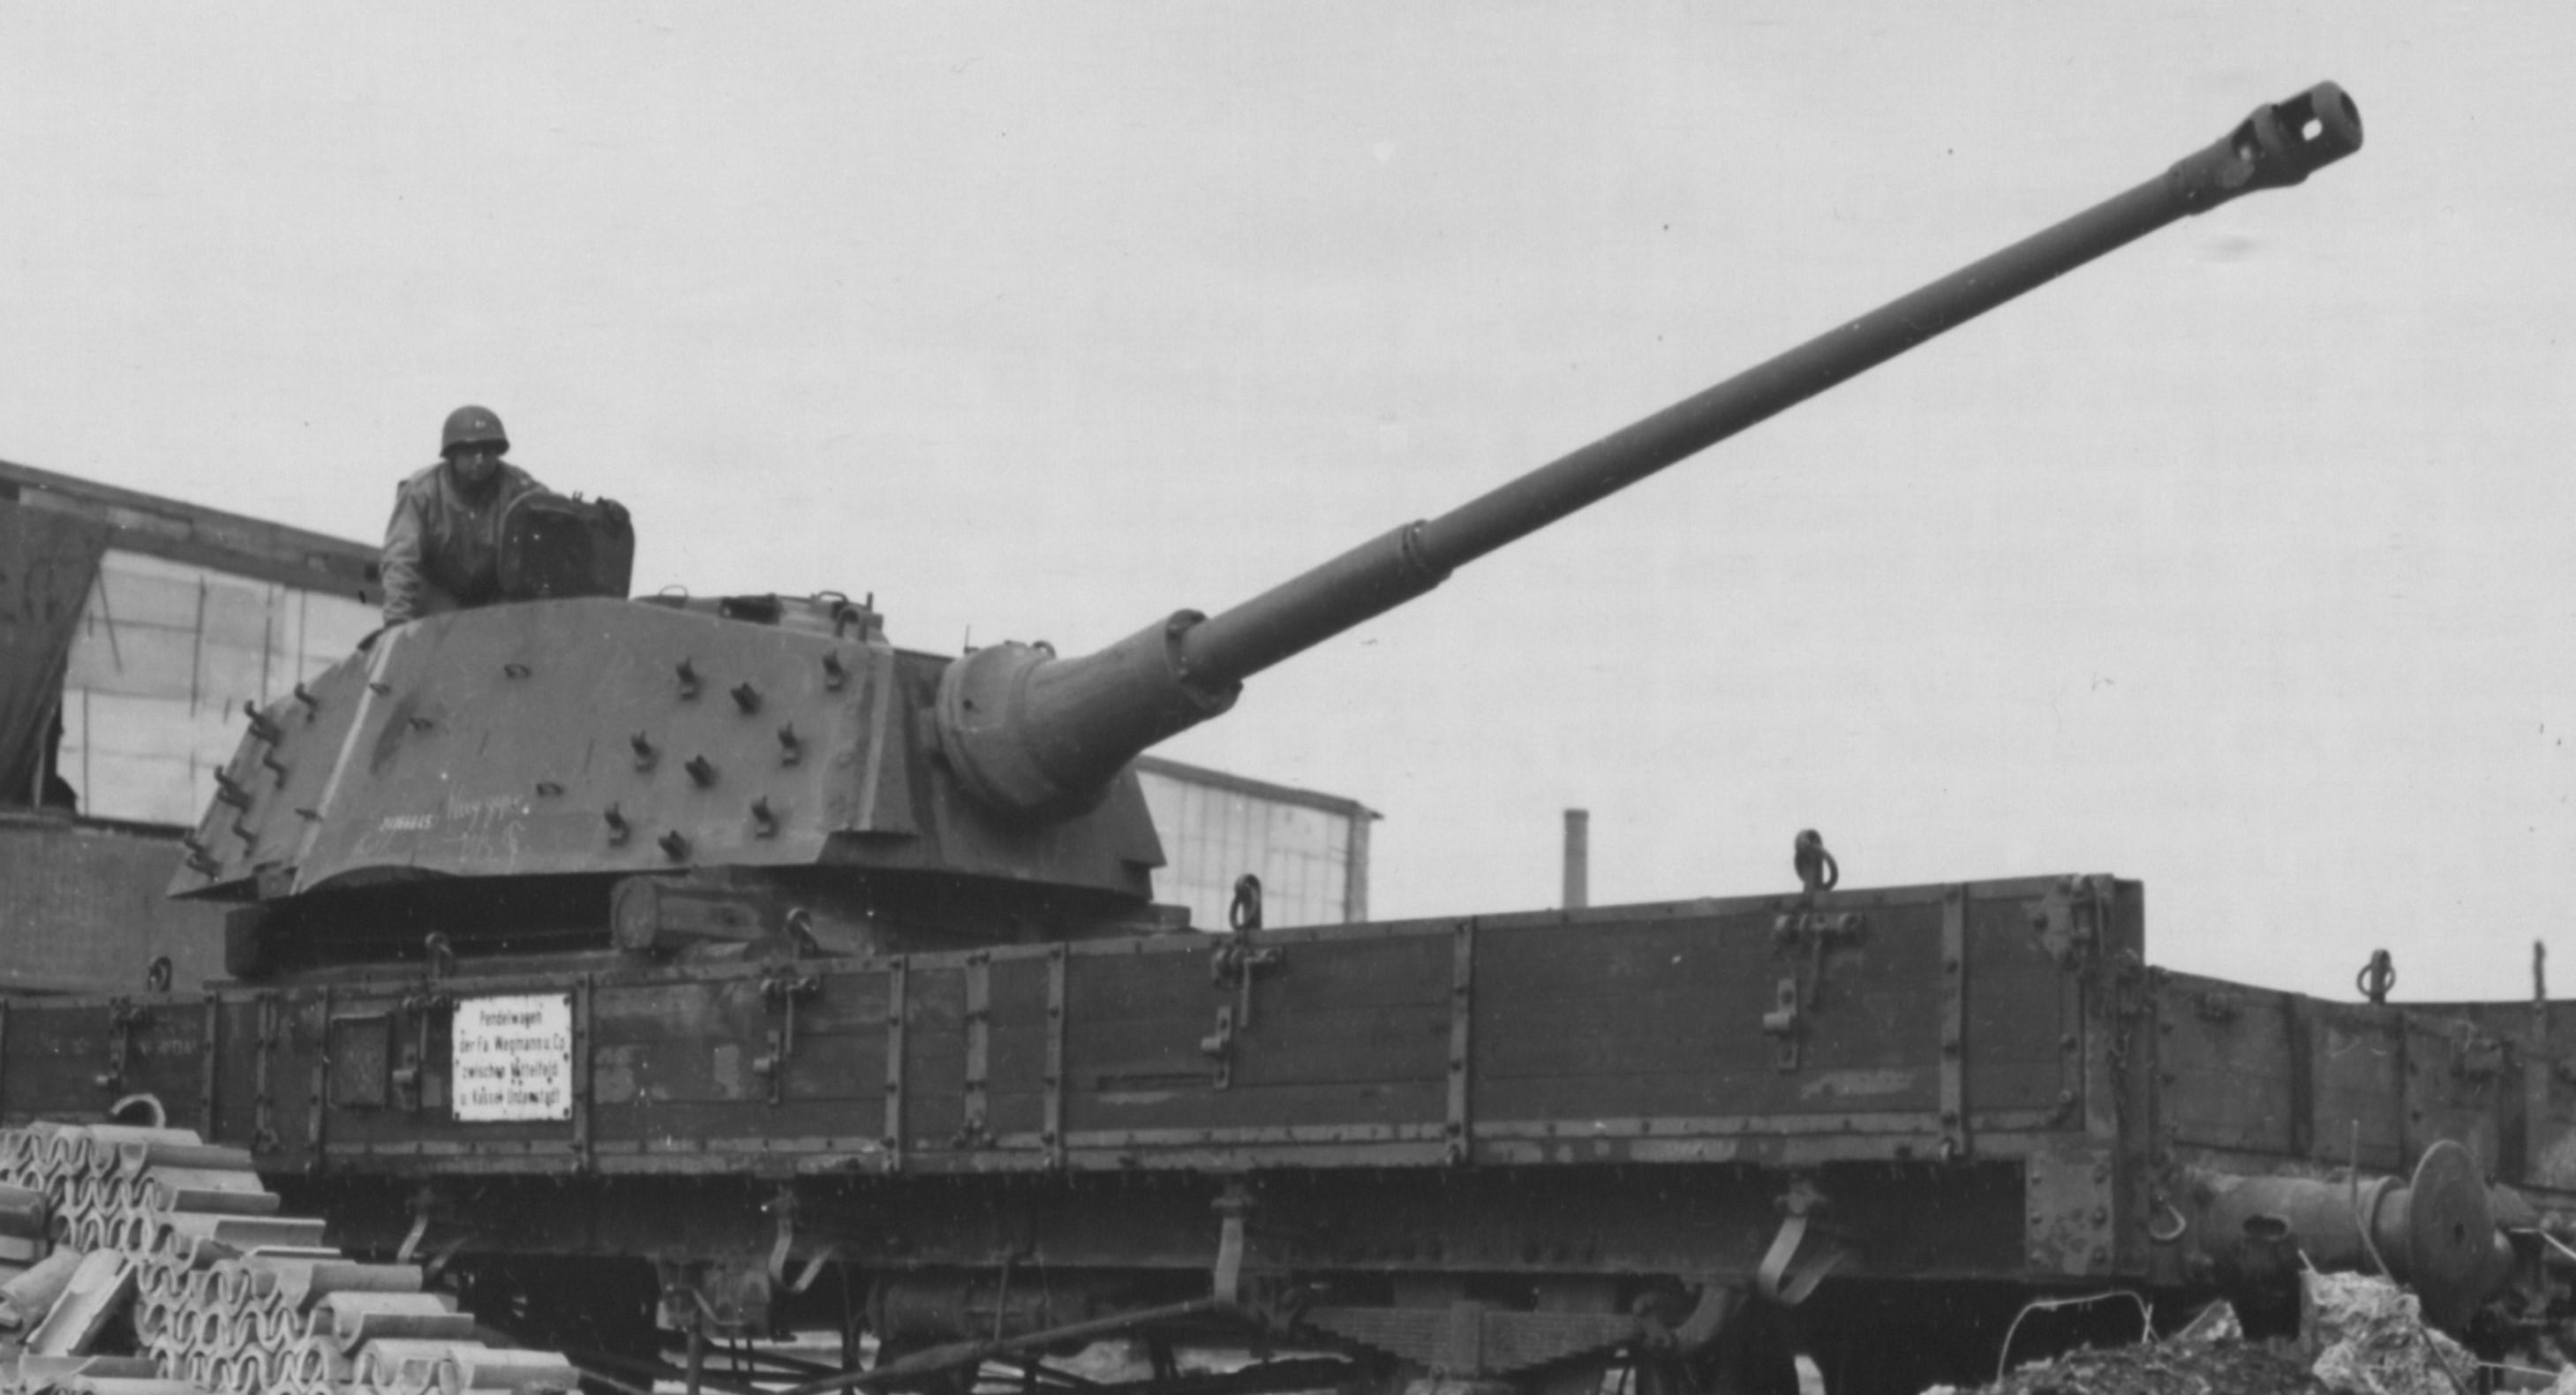 Tiger II Kassel Mittelfeld Henschel plant New spare hanger pattern